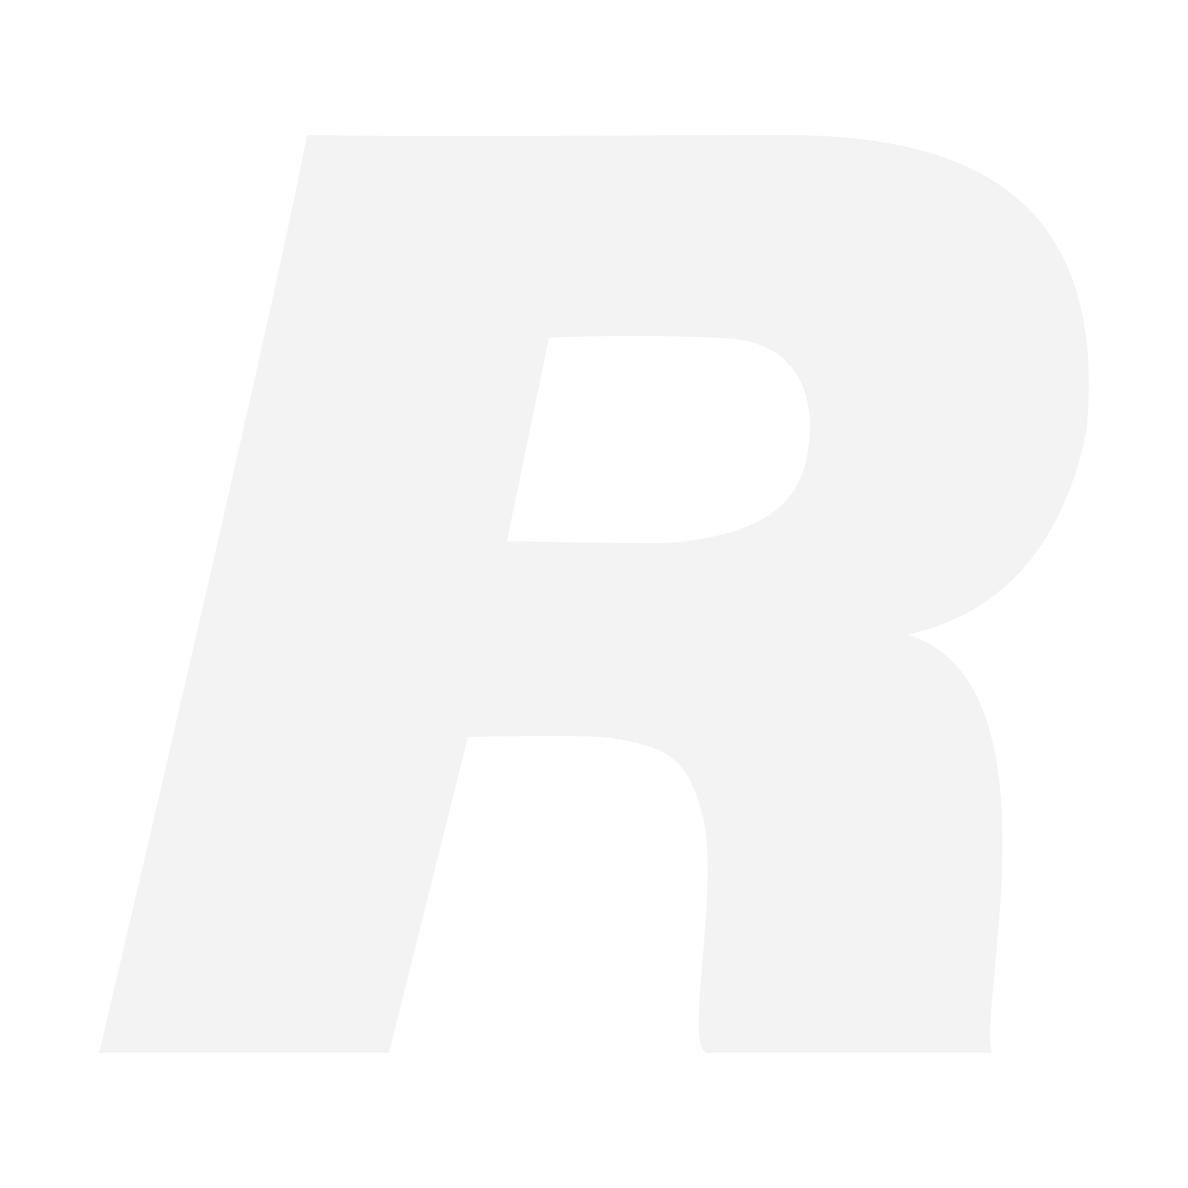 Benro QR-4 -pikakiinnityslevy(S2)